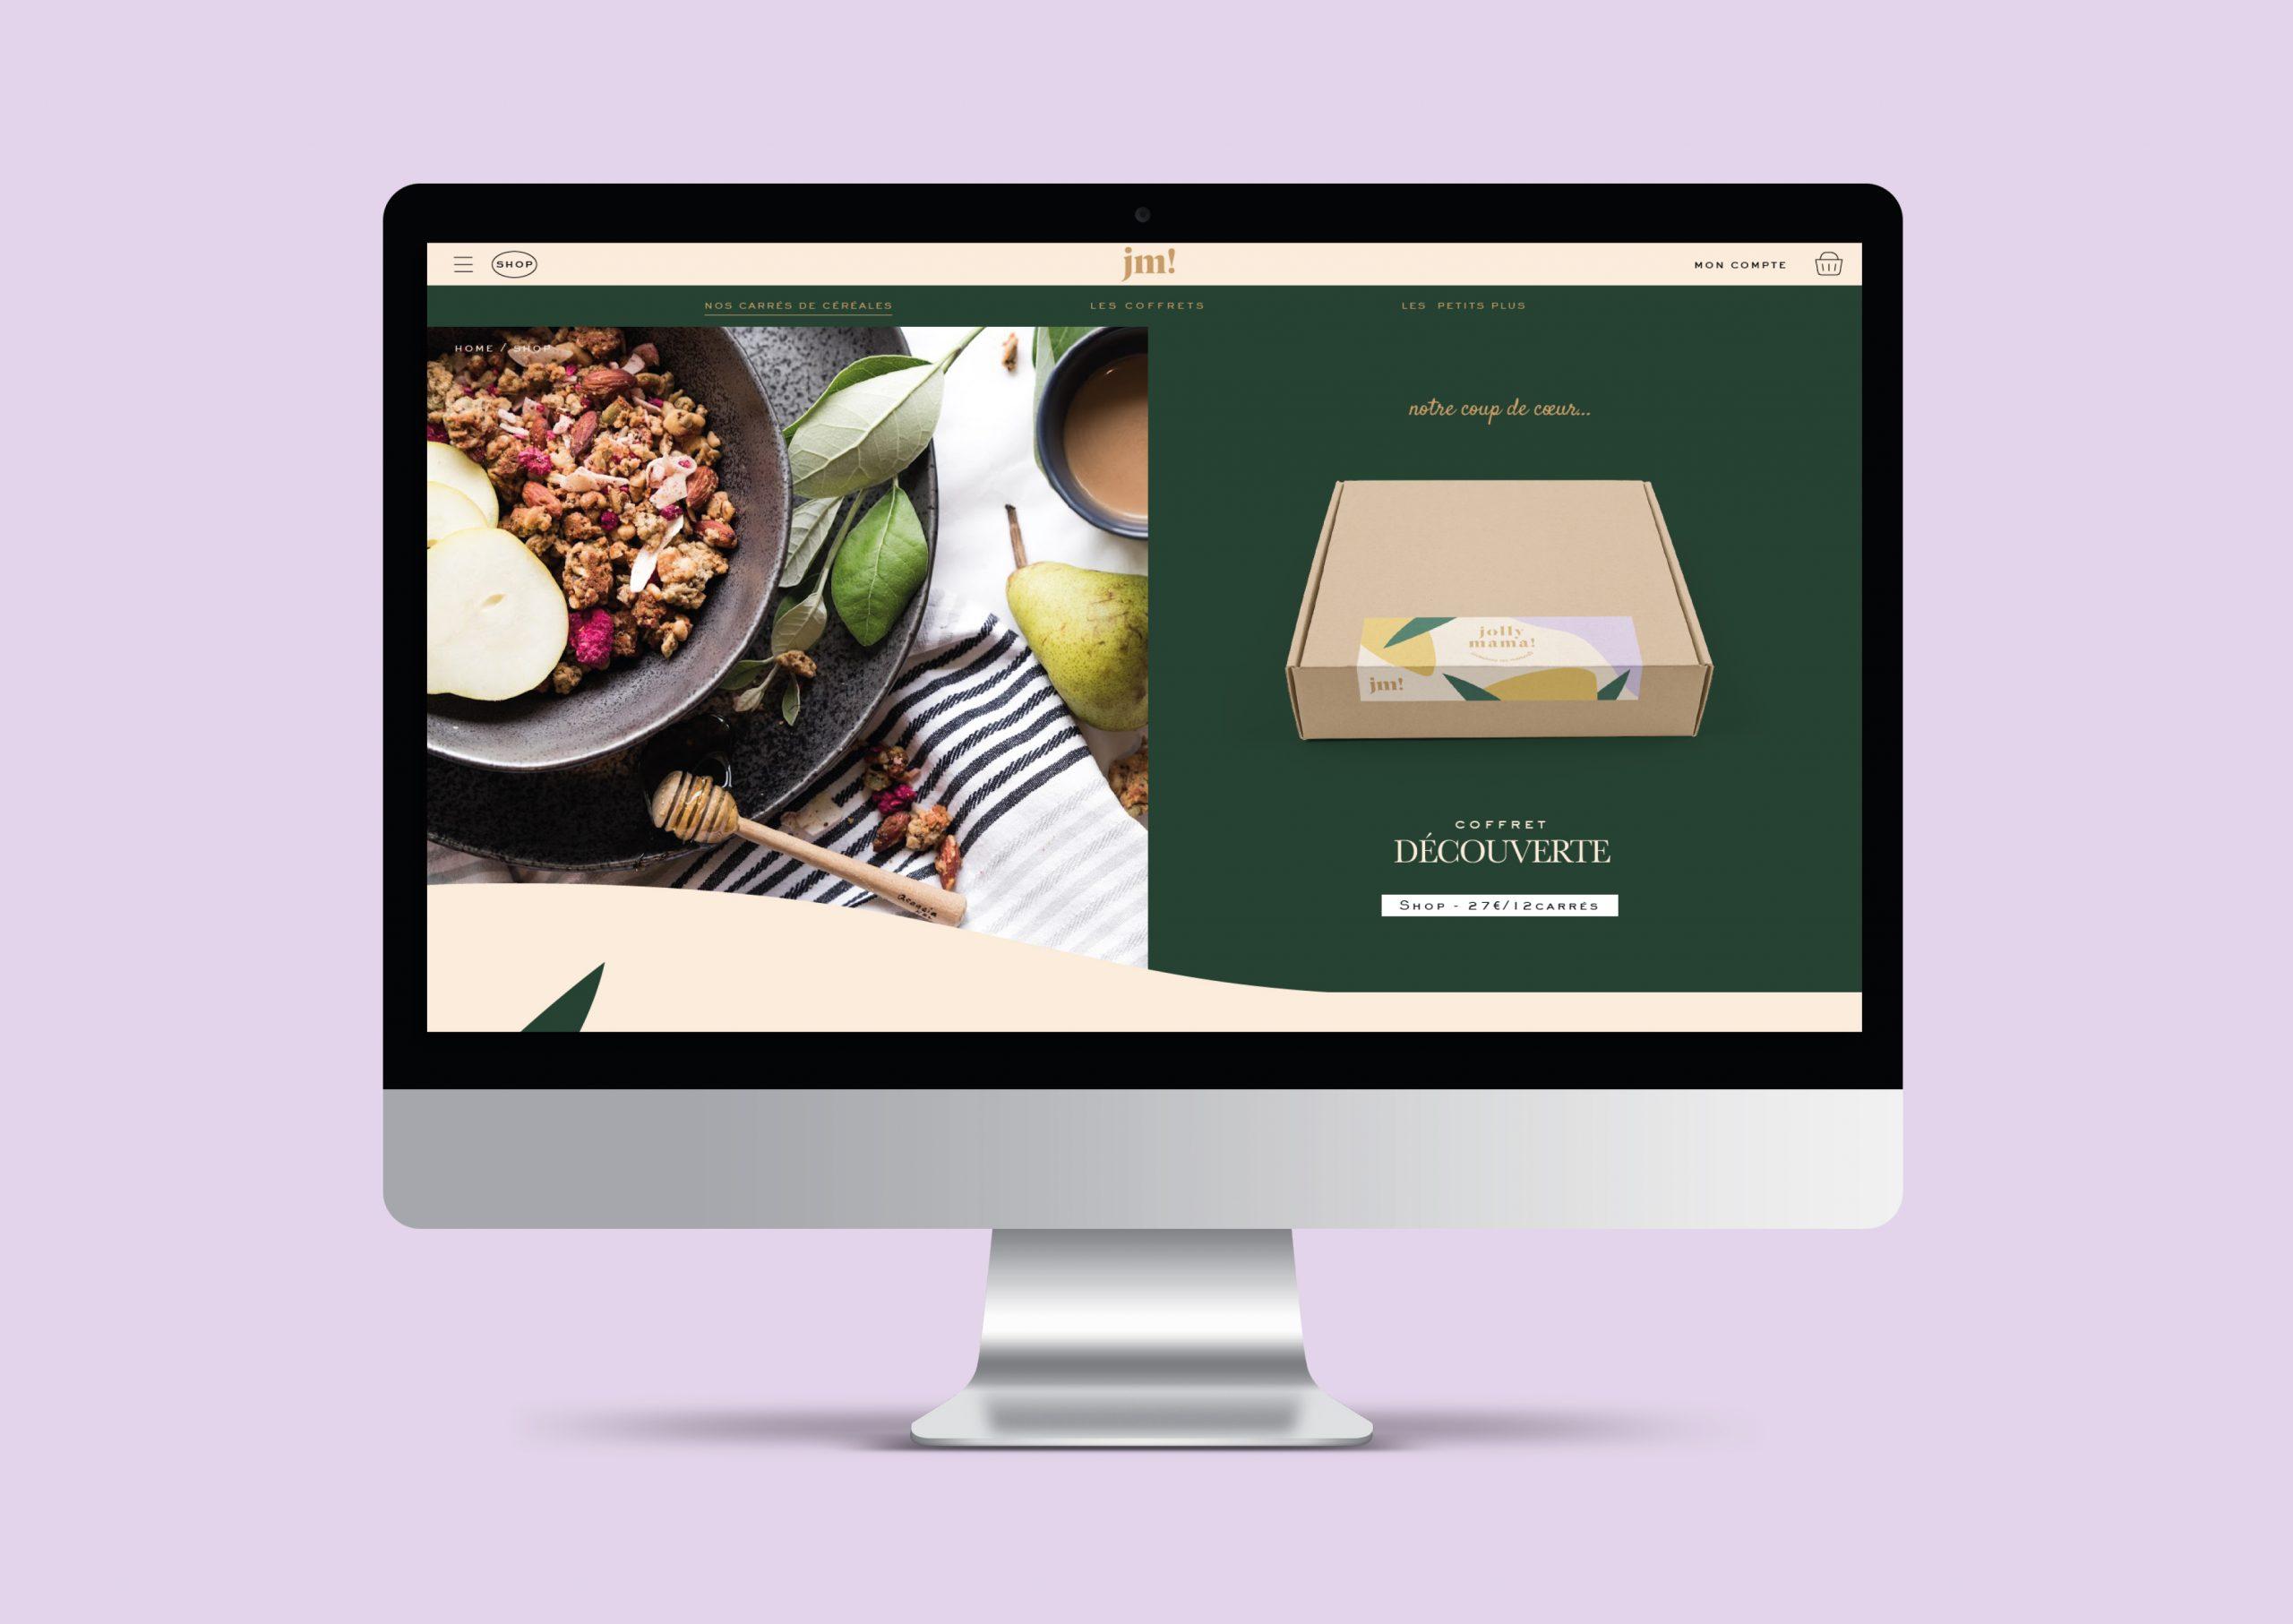 site desktop coffret decouverte Jolly Mama